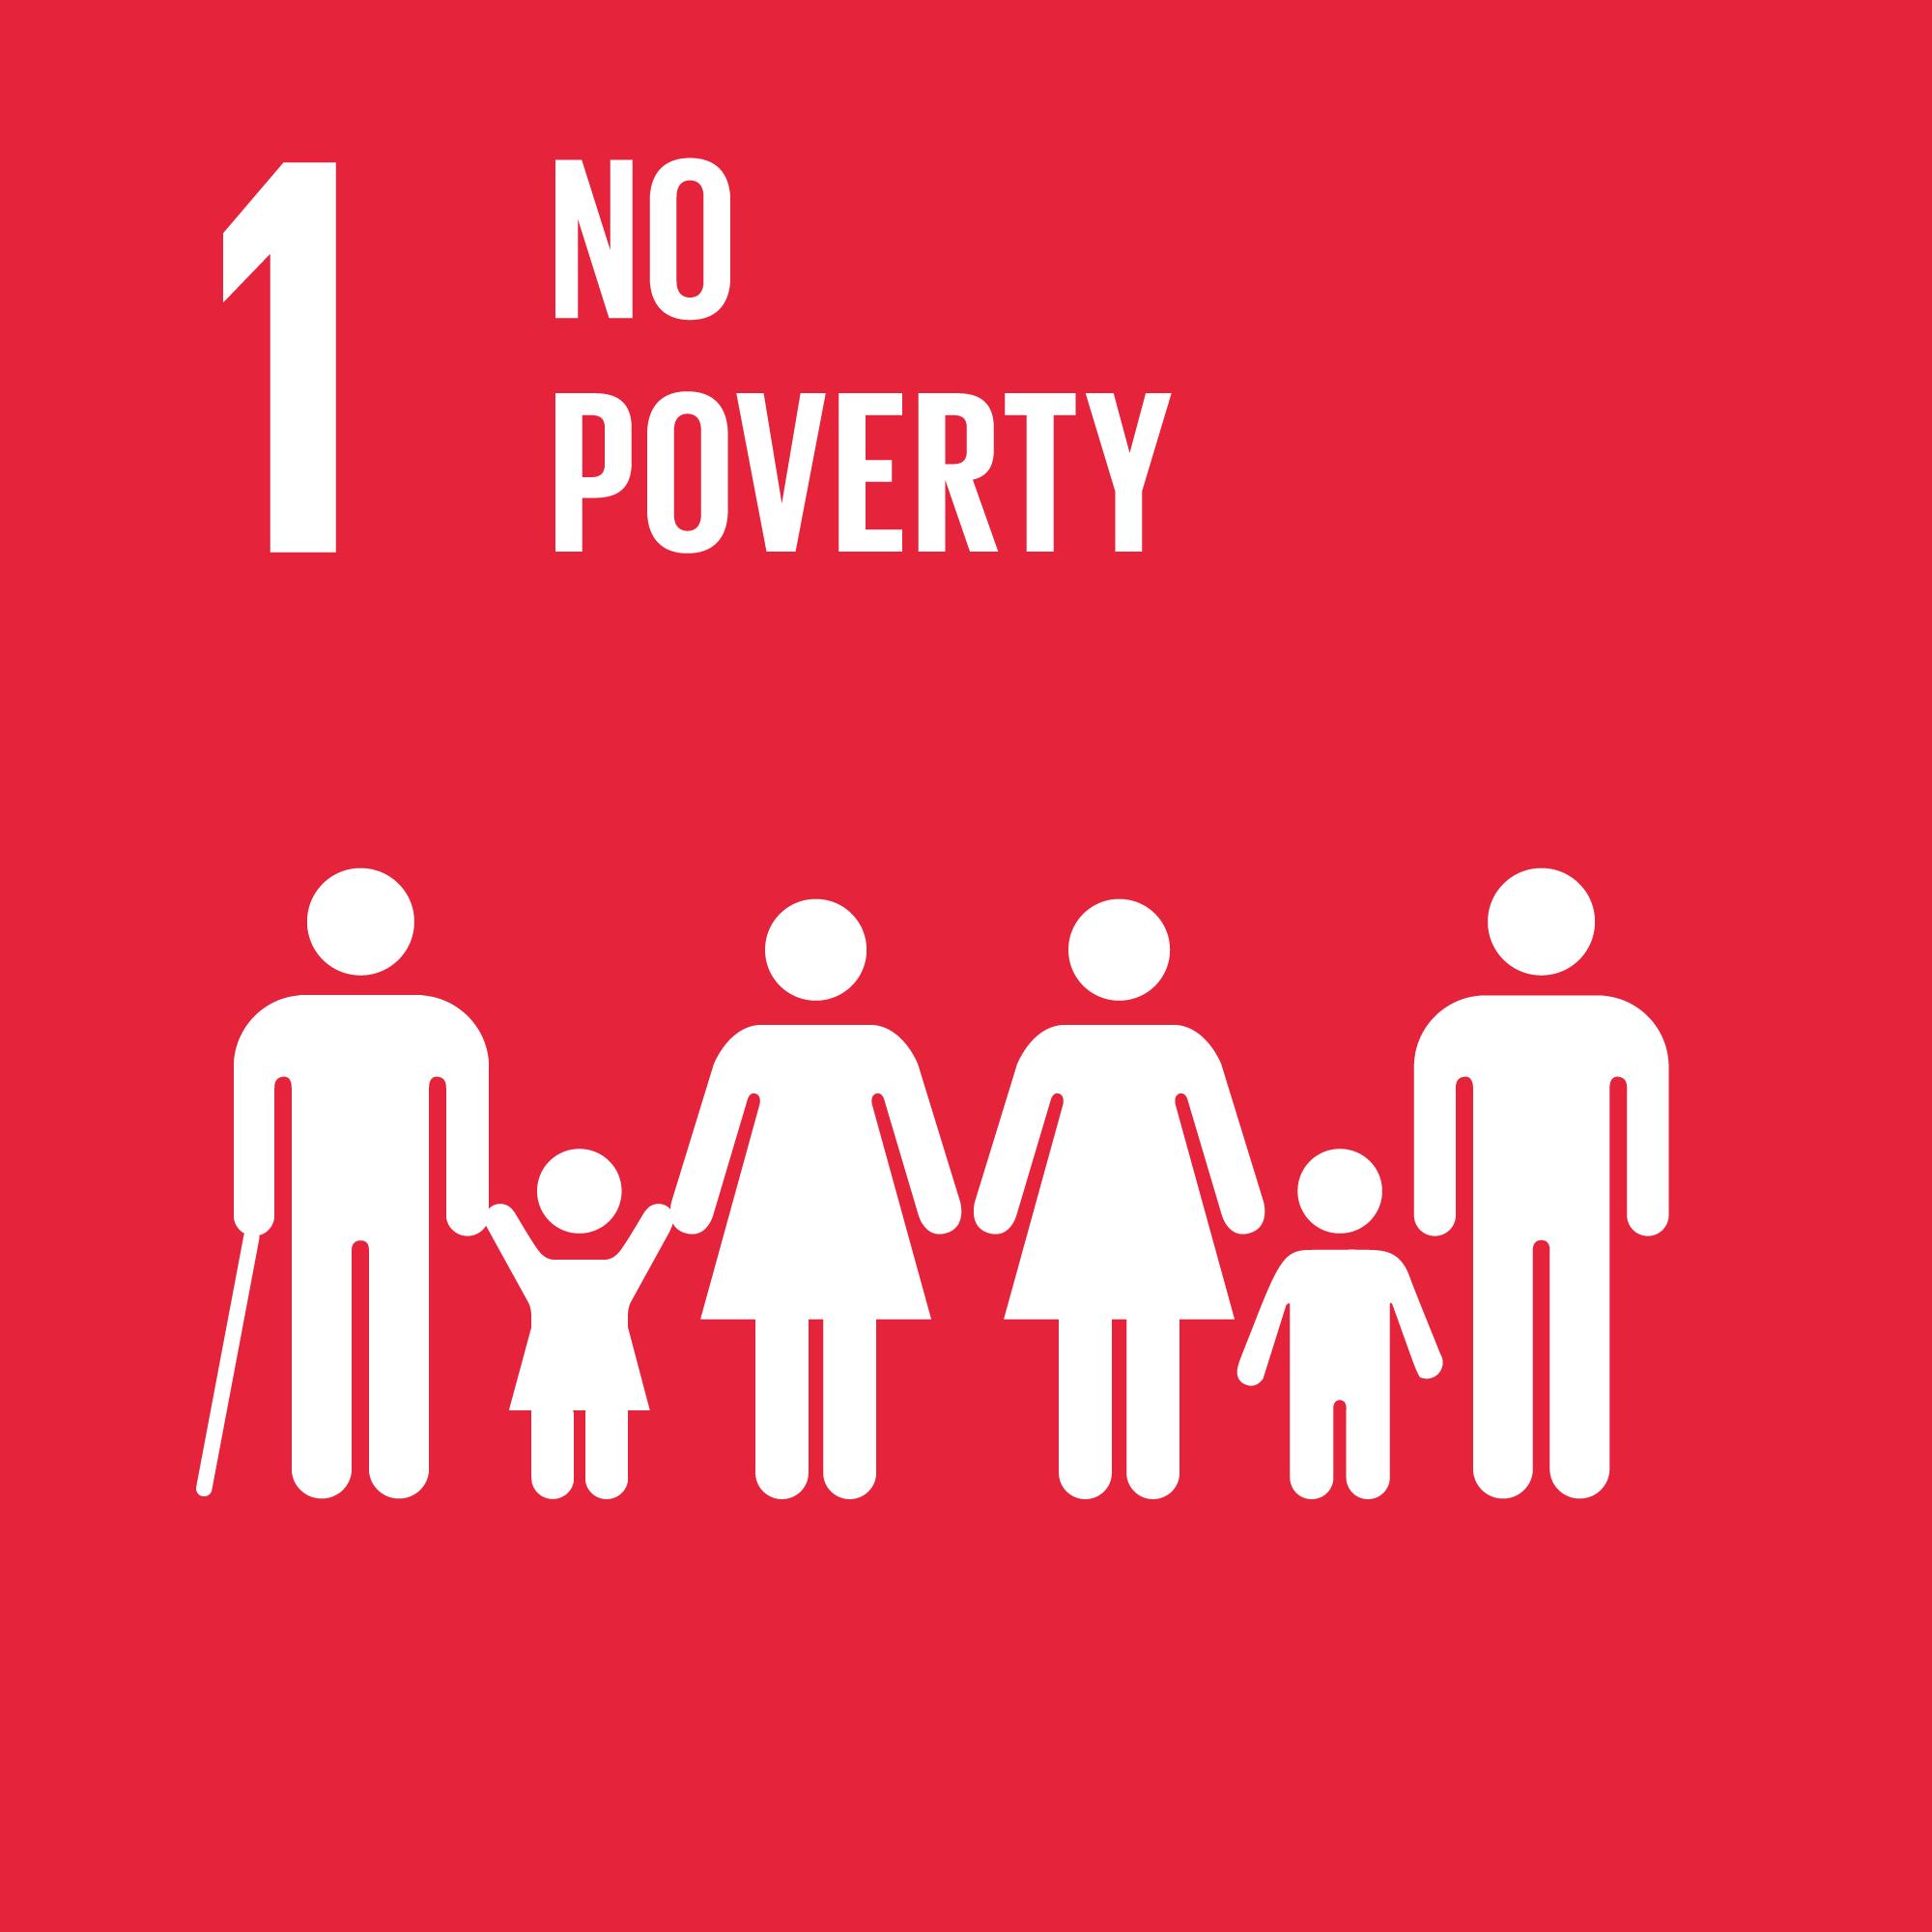 Sustainable Development Goal 1 | No Poverty